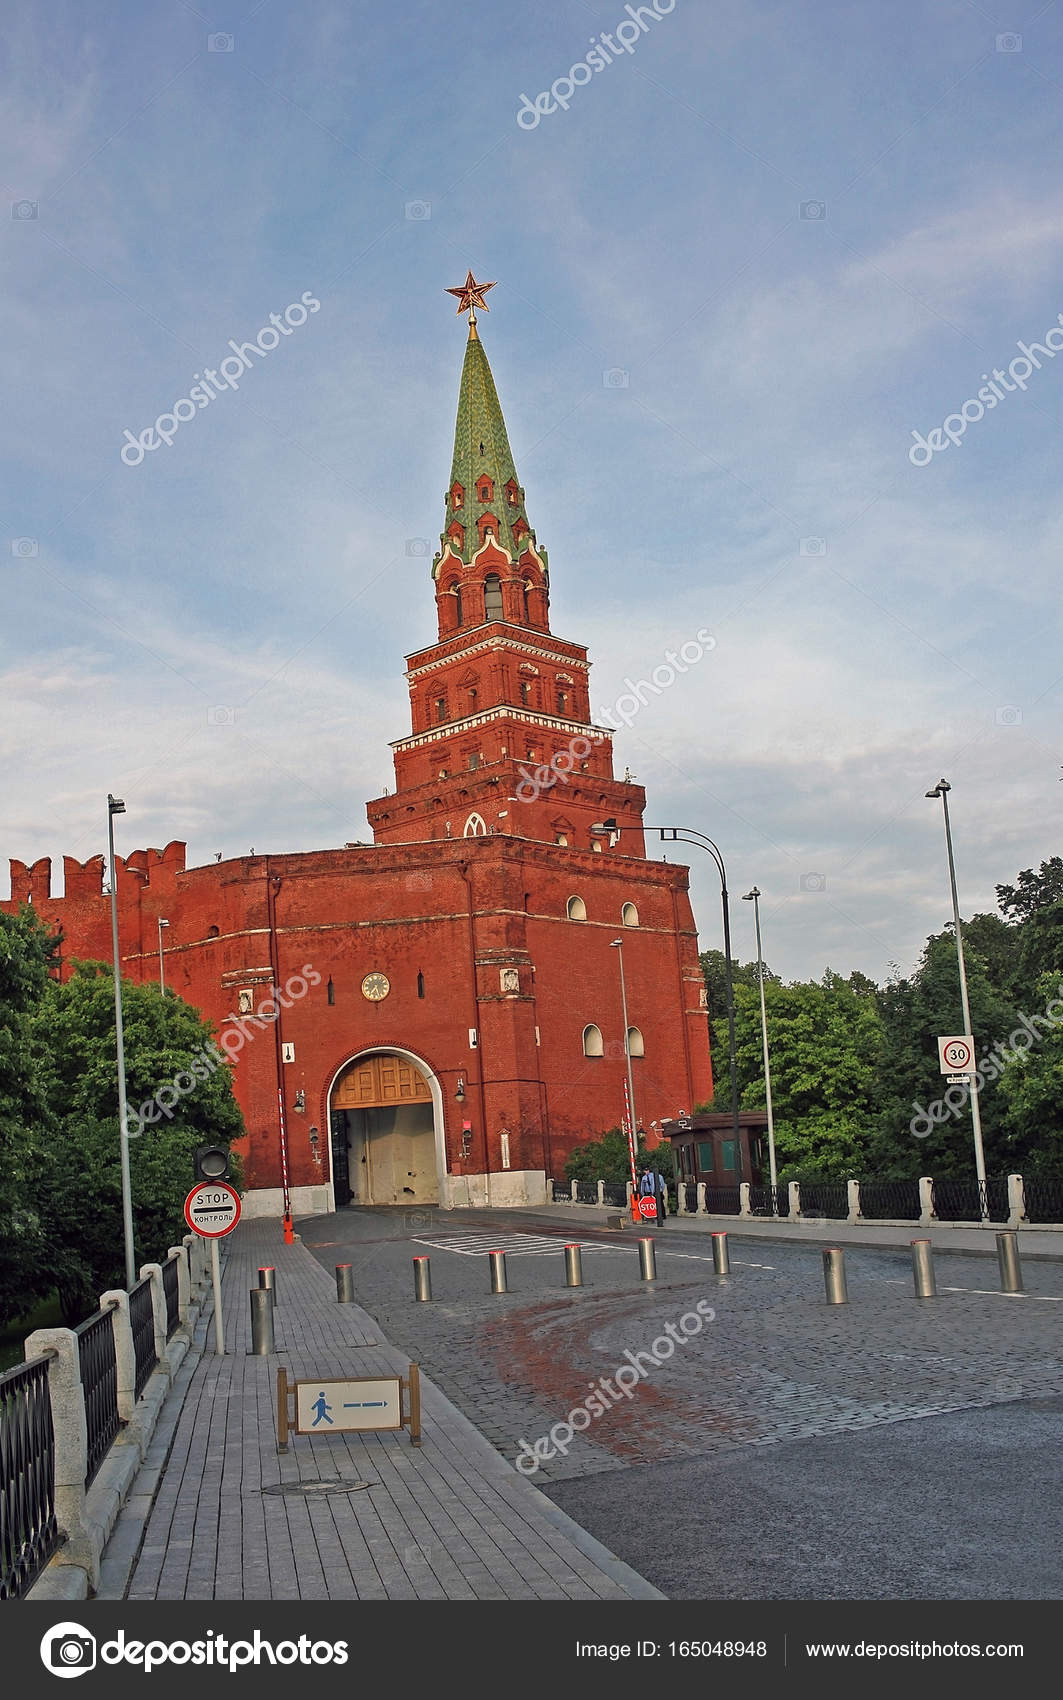 Borovitskaya tower: description and photo 8